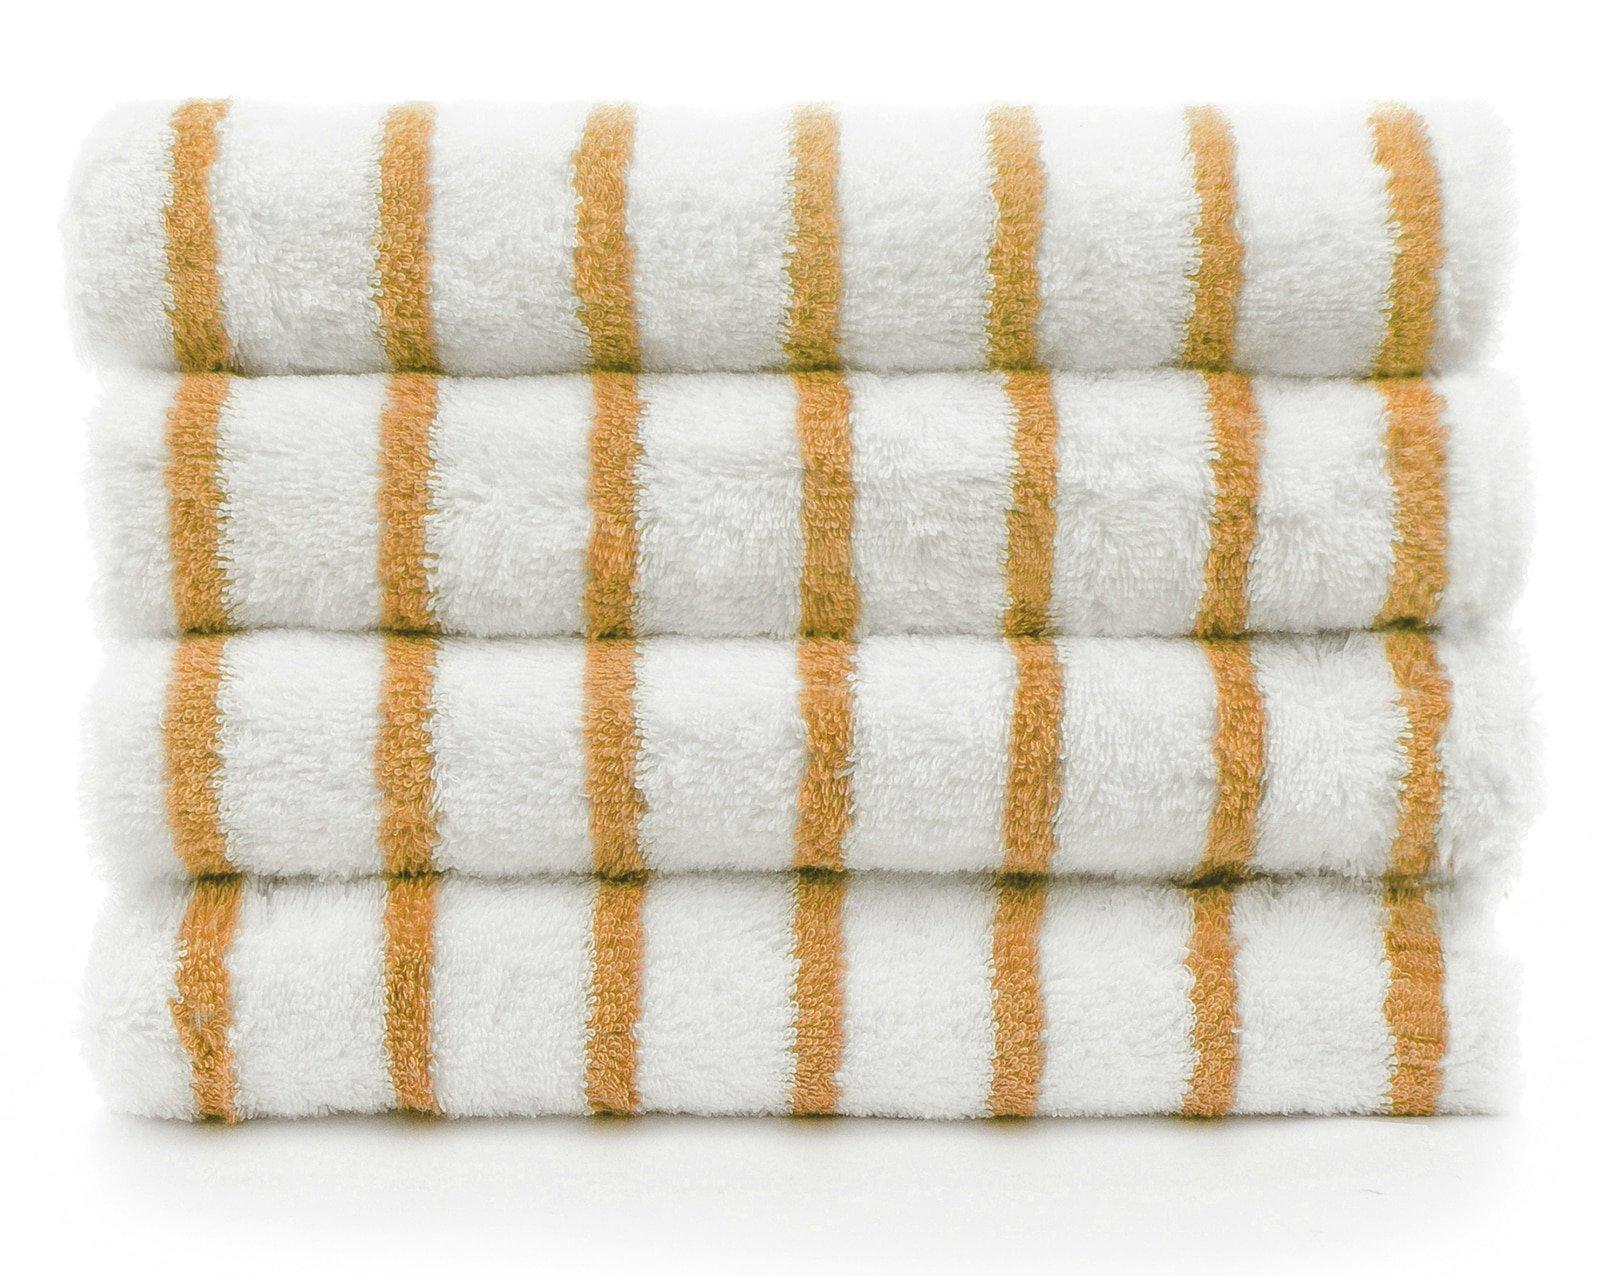 INDULGE Large Beach and Pool Towel, Thin Stripe, 100% Turkish Cotton (30x60 inches) (4, Salmon - Thin Stripes)